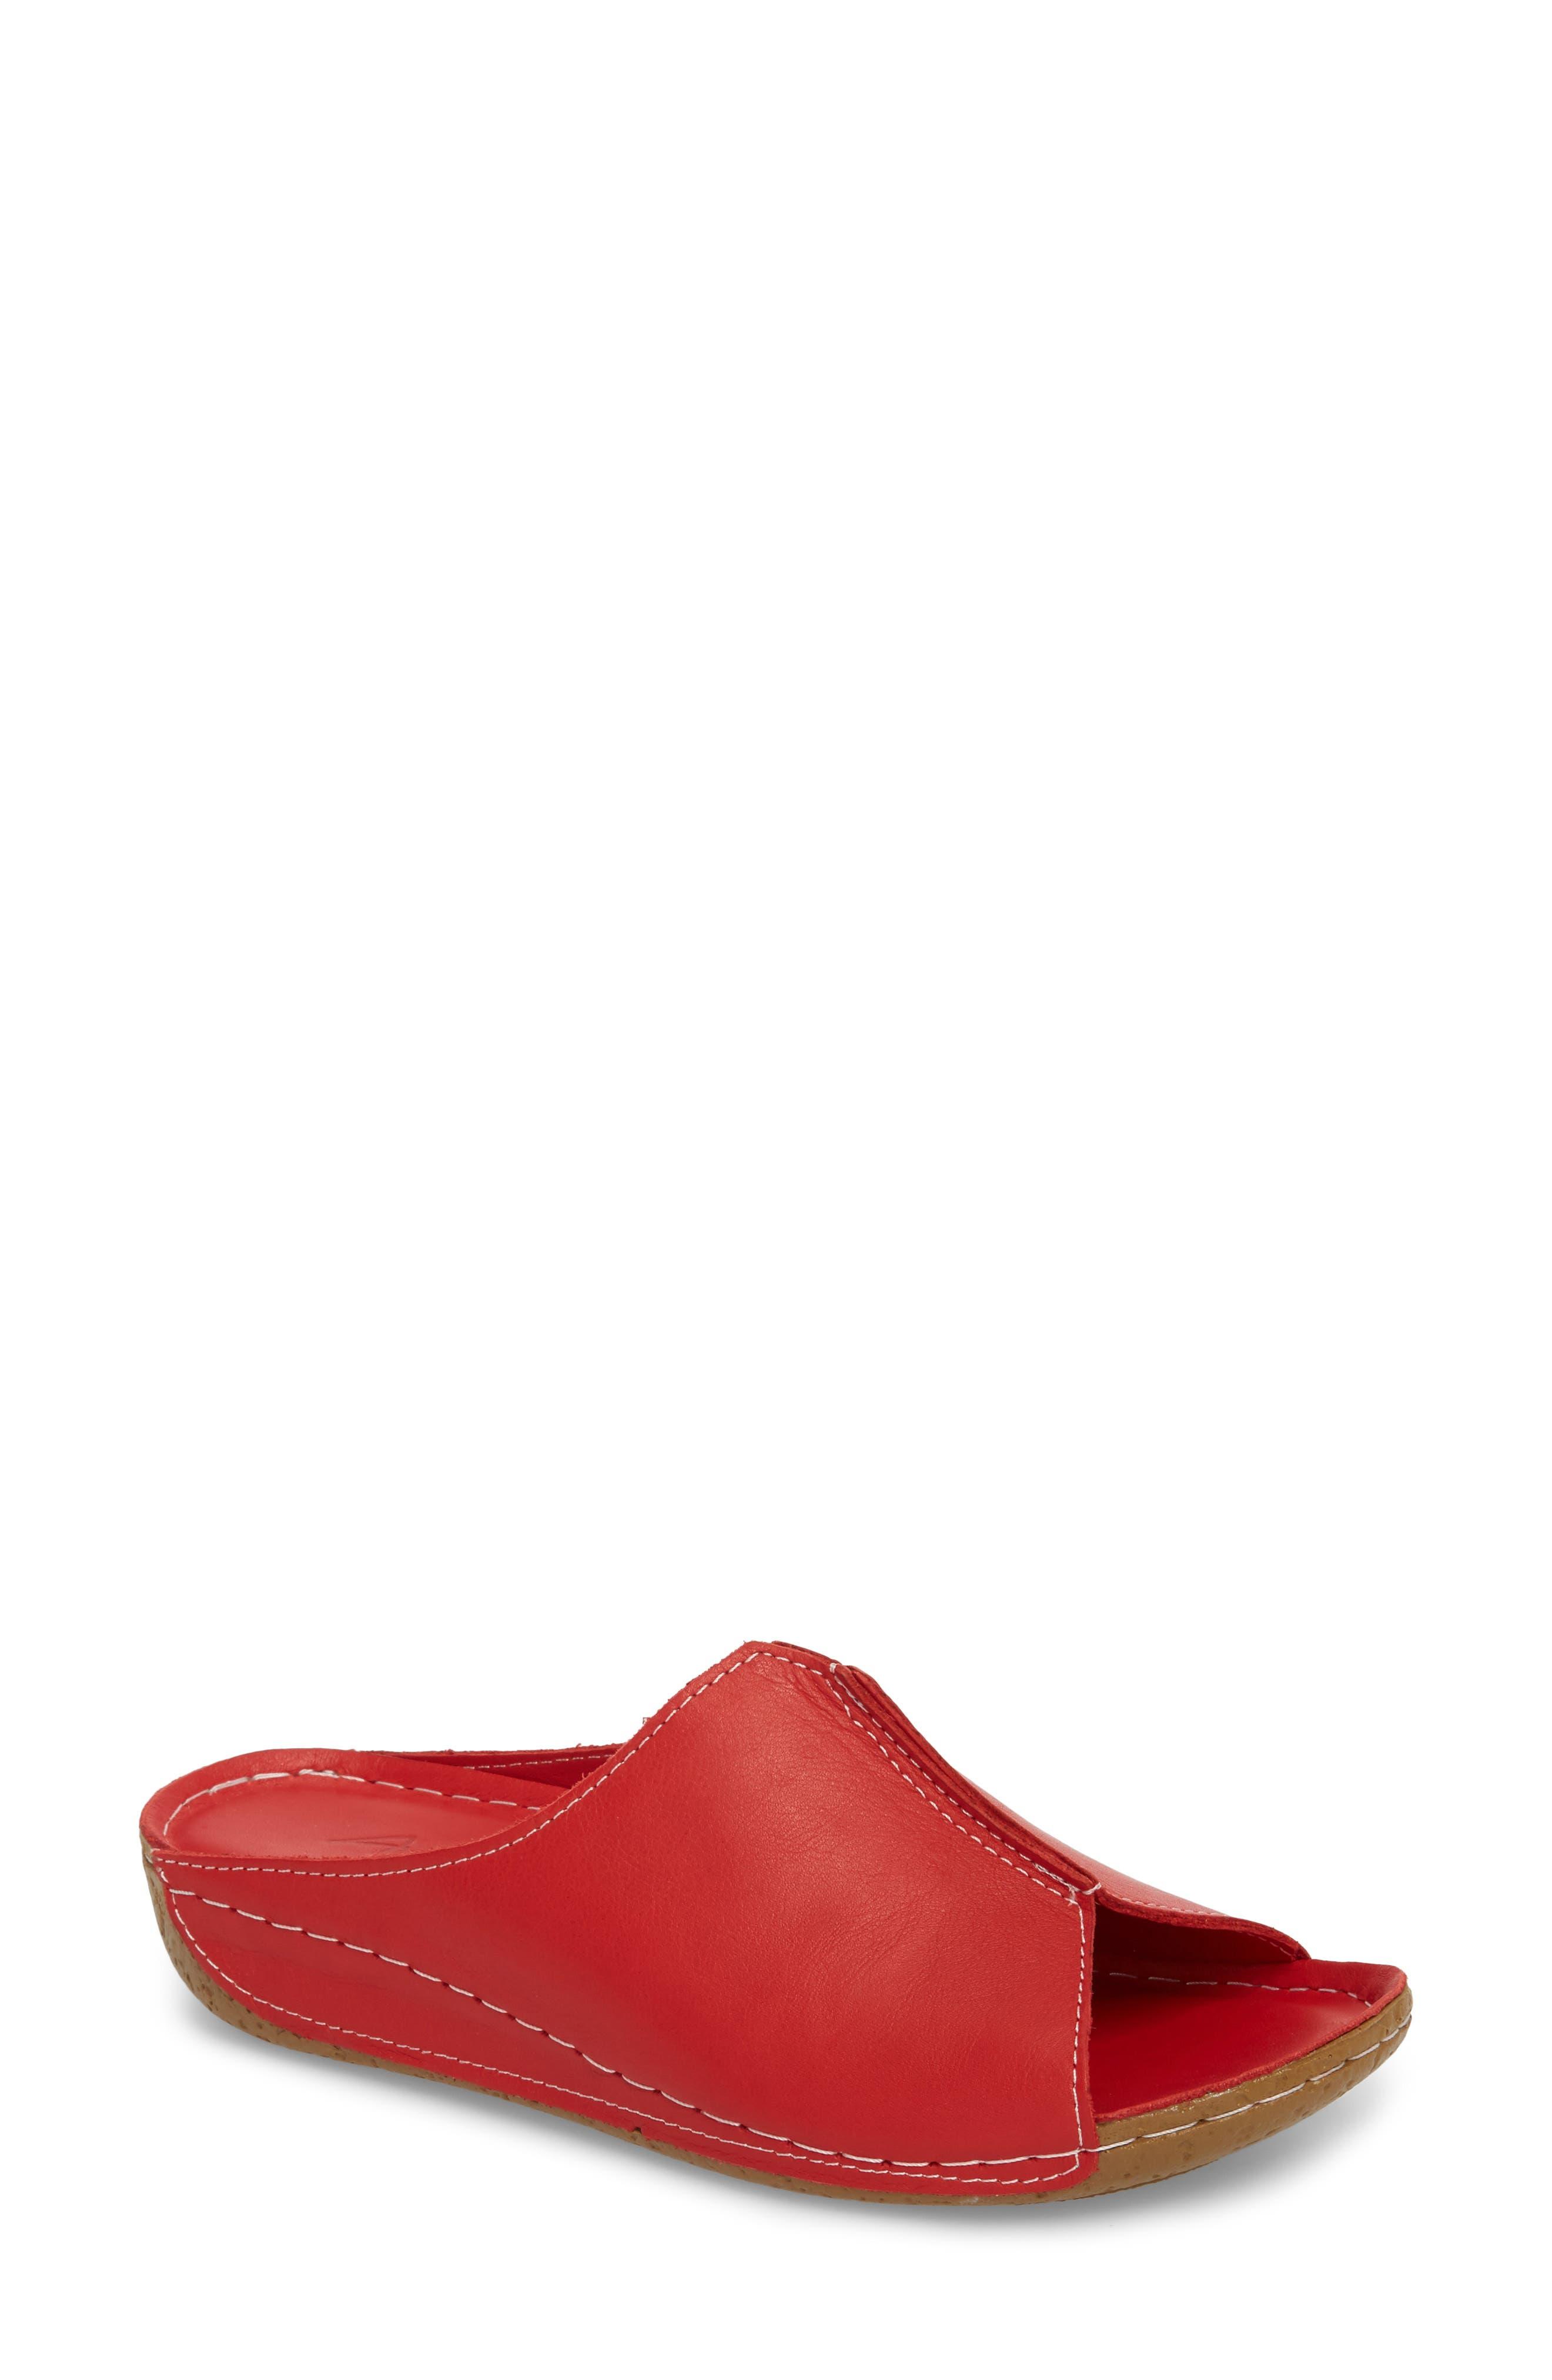 Sheridan Mia Alexa 3 Slide Sandal Red